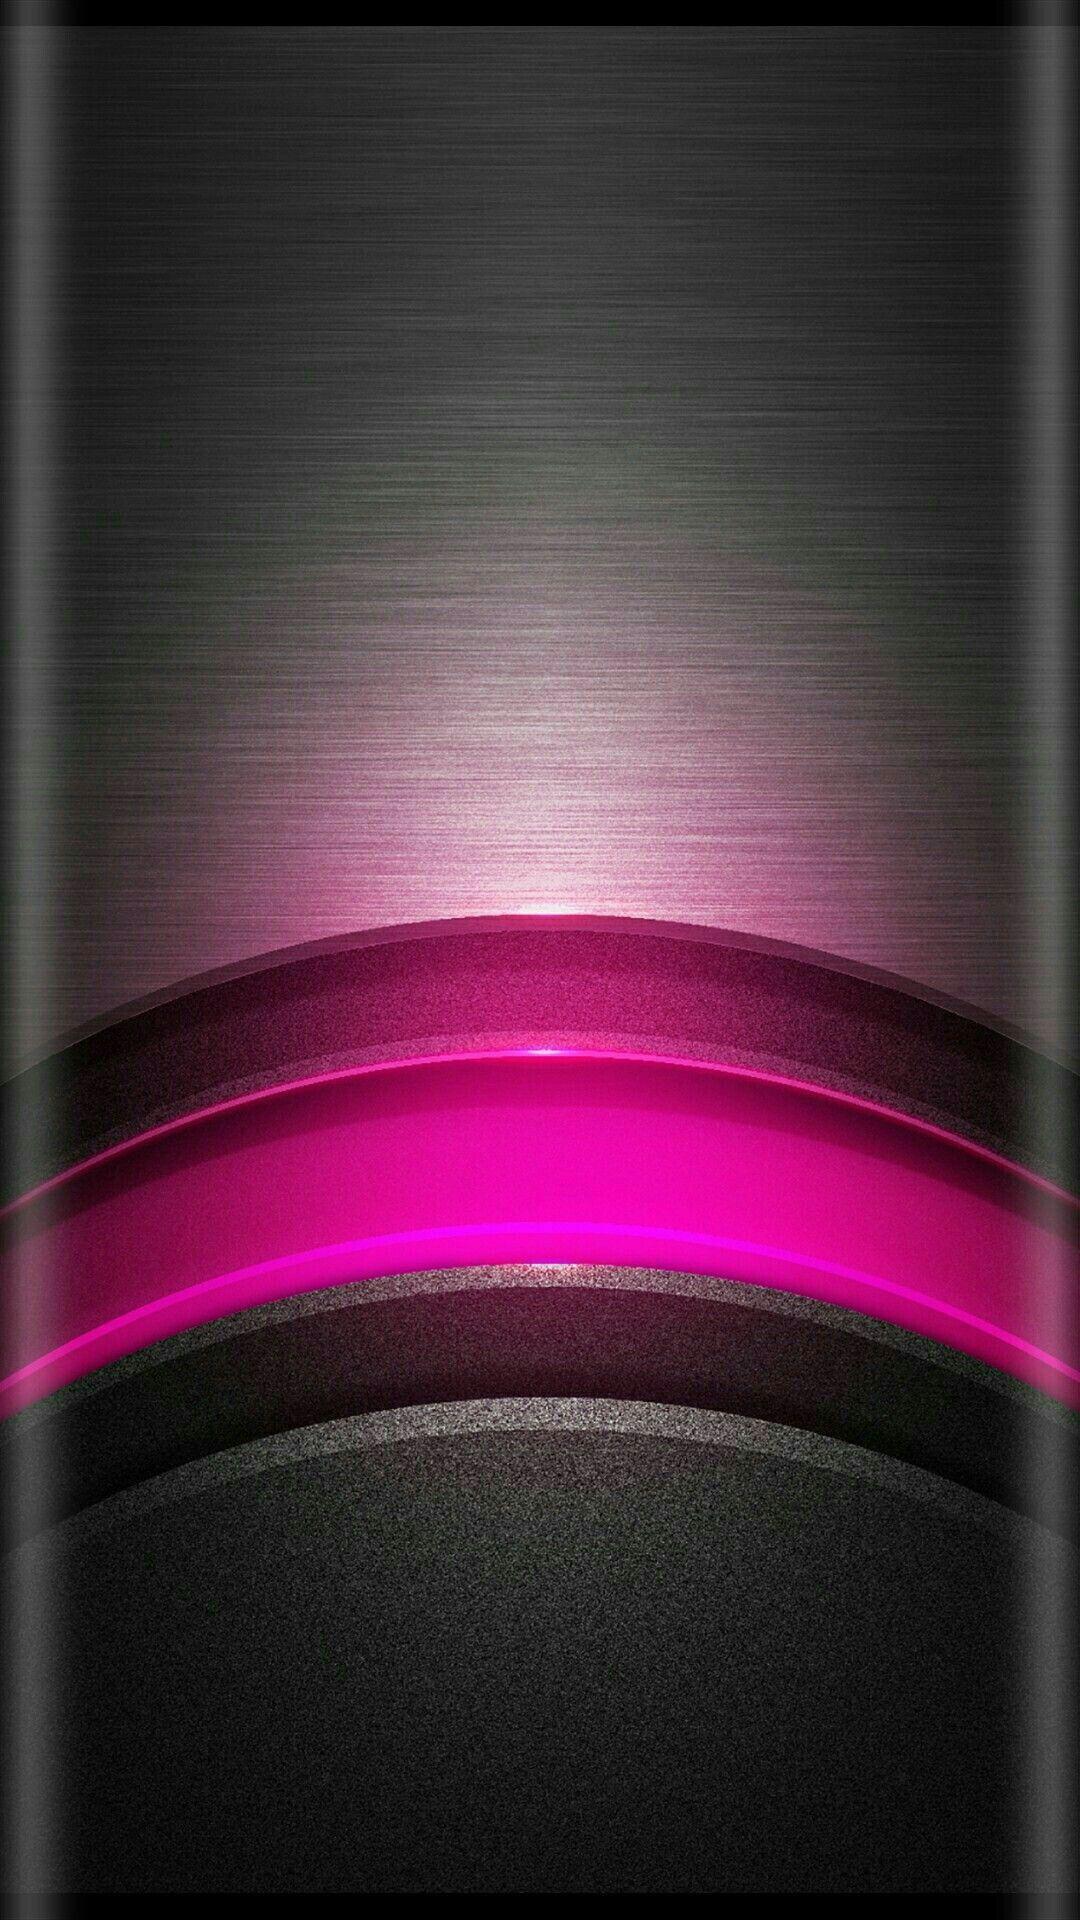 Samsung Iphone Edge Phone Telefon 3d Wallpaper Neon Light Wallpaper Wallpaper Edge Cellphone Wallpaper